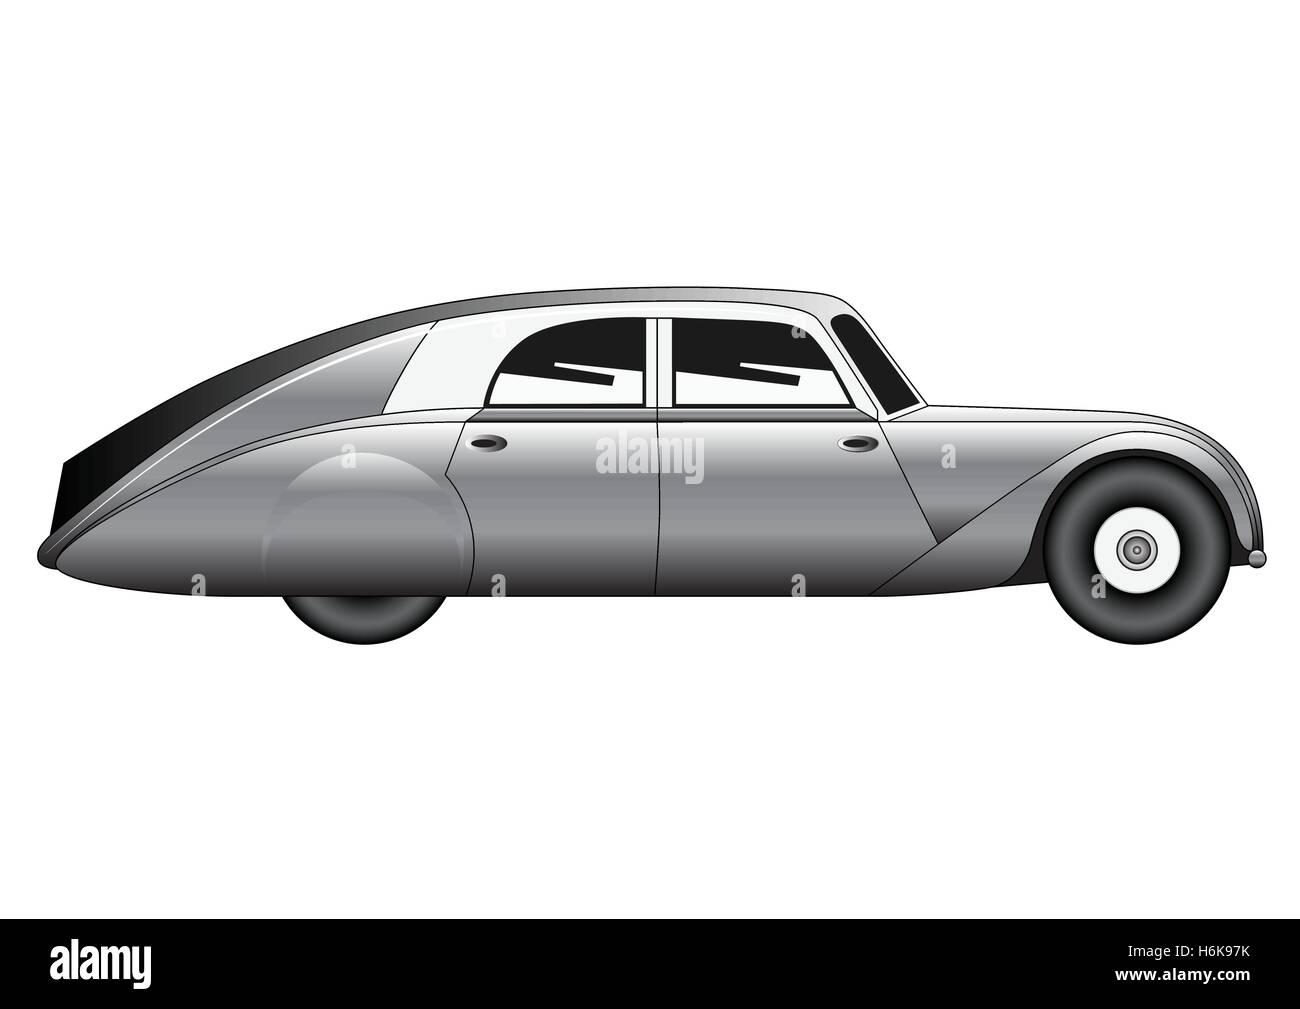 Sedan - vintage model of car - Stock Image